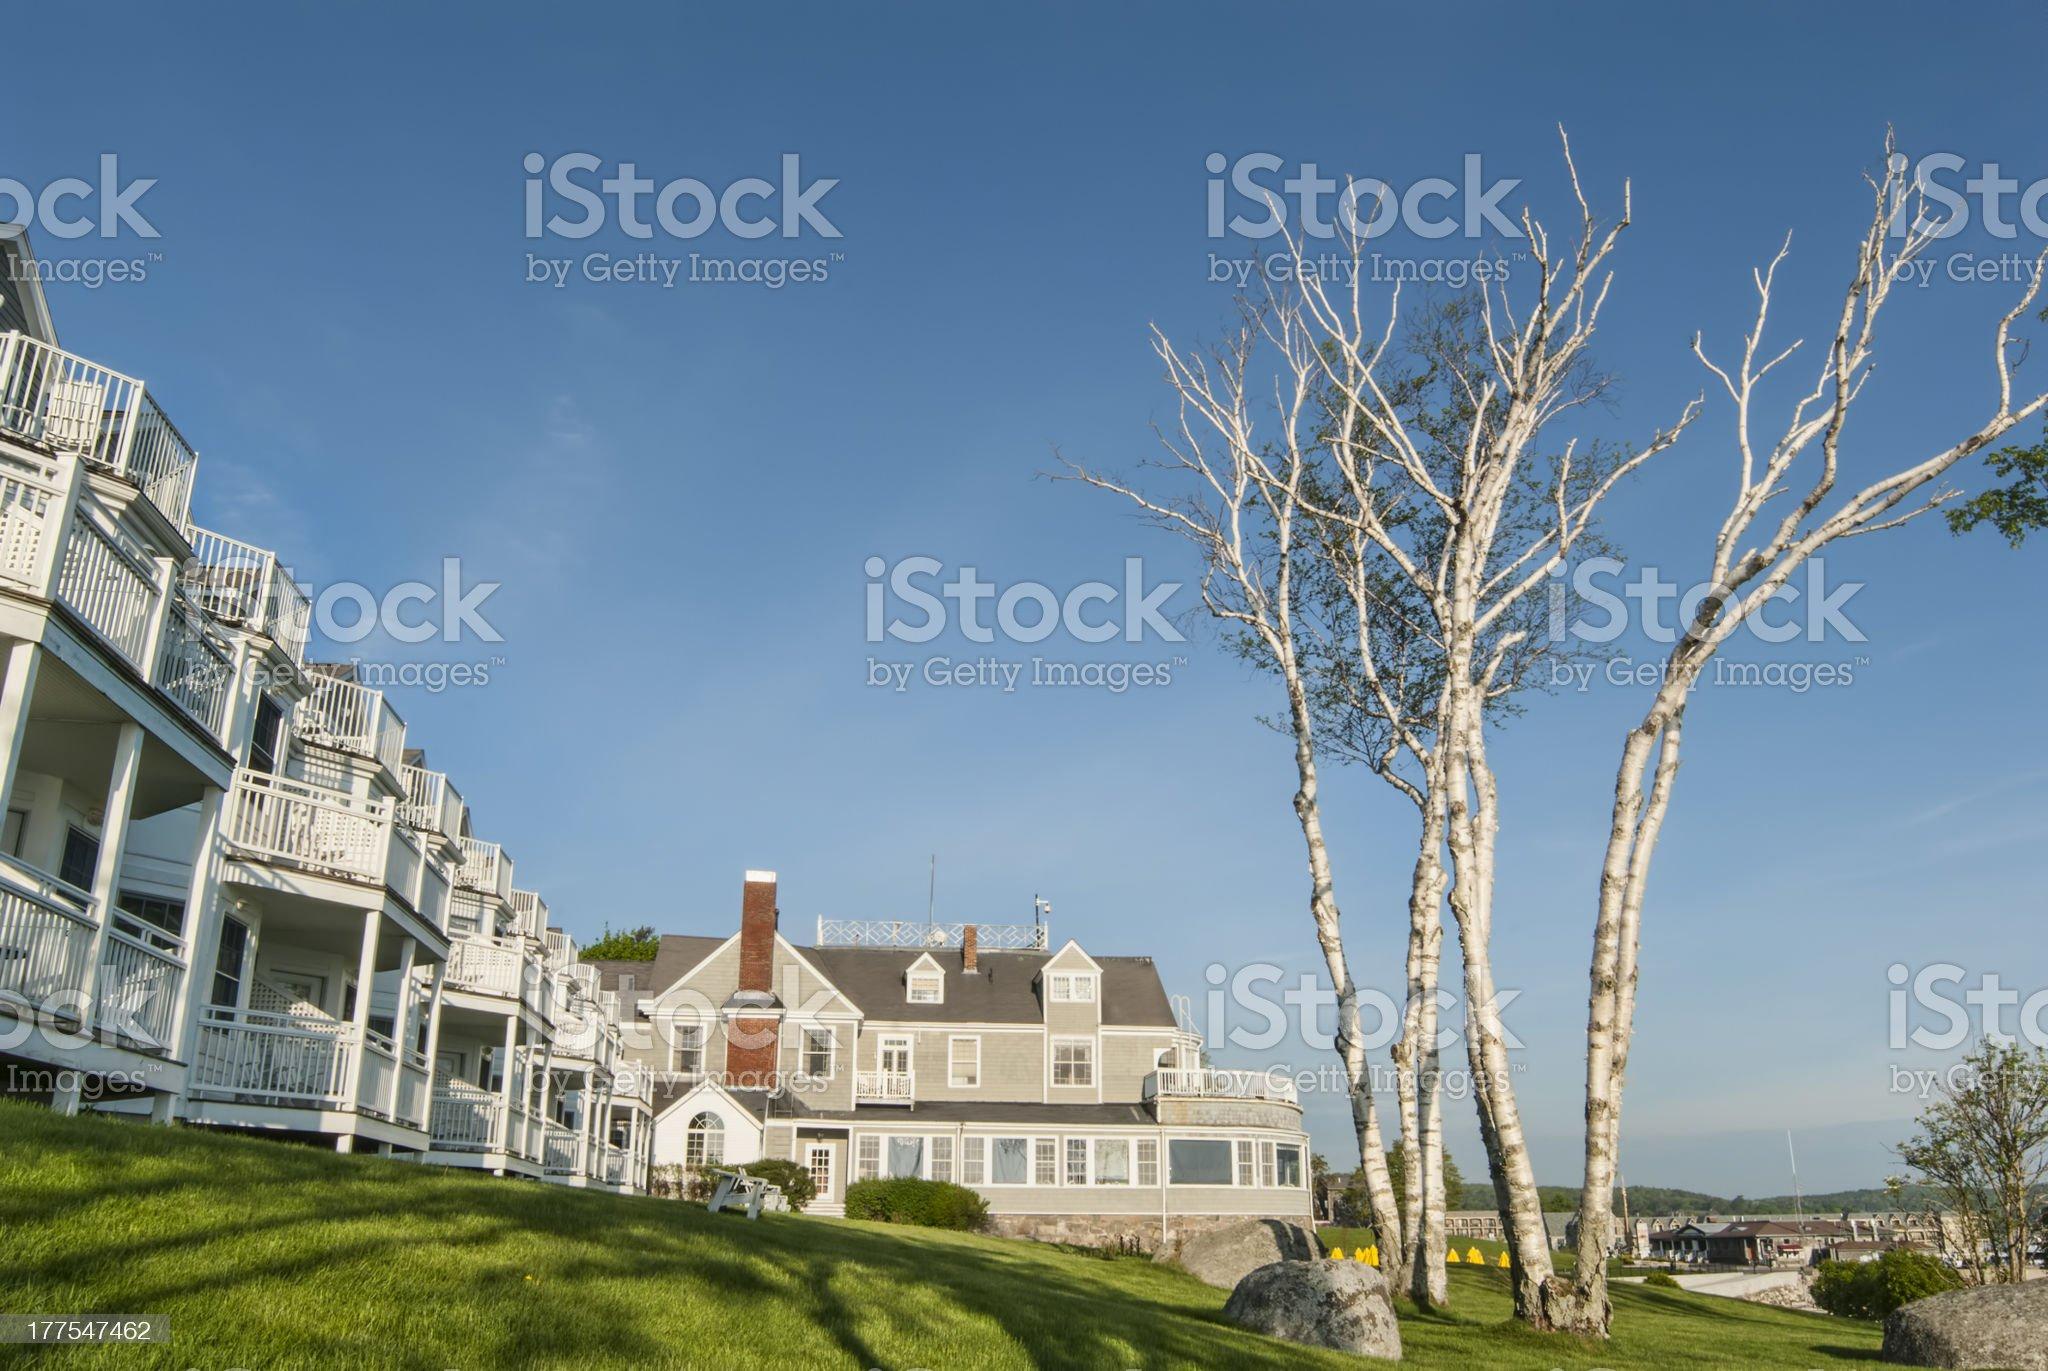 Inn royalty-free stock photo